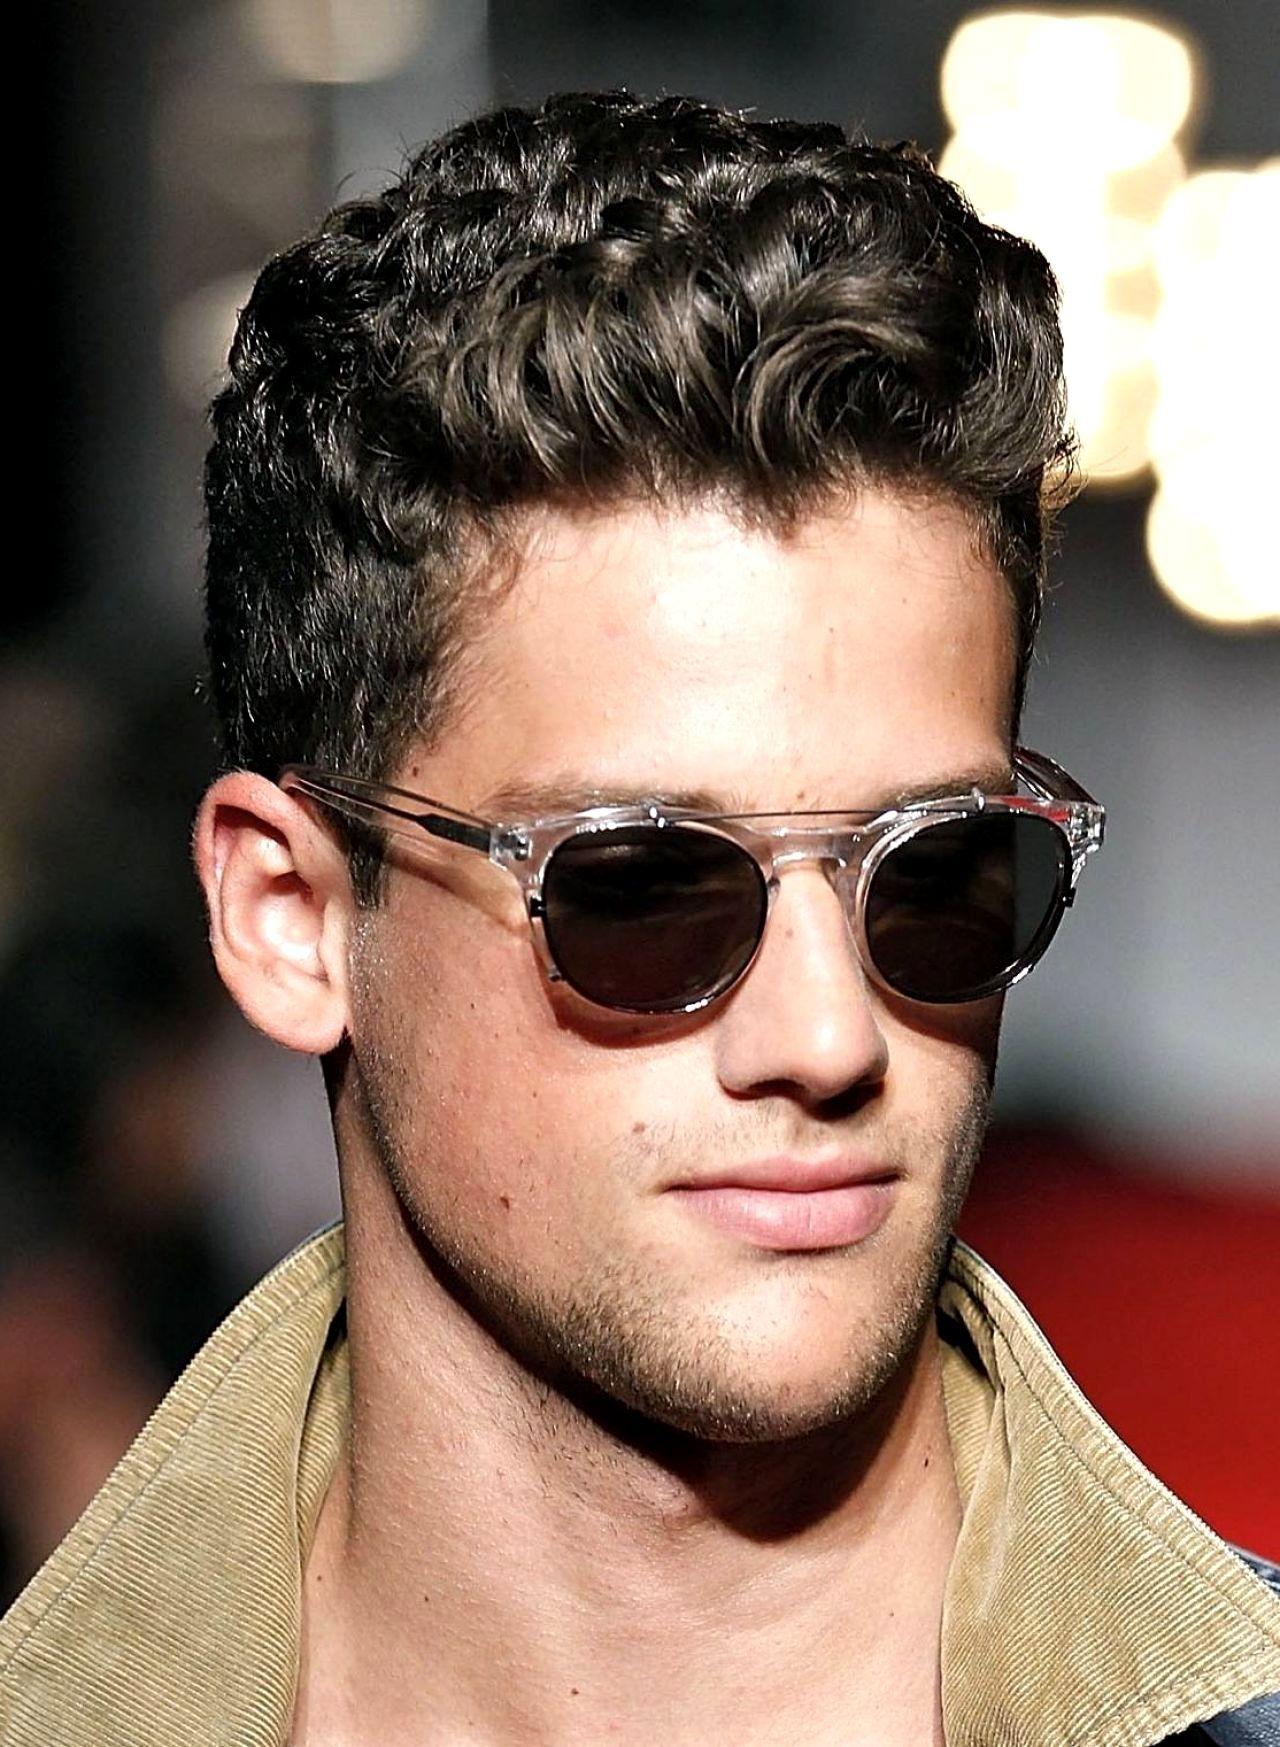 Fashion Short Hairstyles Men Thick Hair Medium Hairstyles Men S Wavy Hairstyle Medium In 2020 Curly Hair Men Male Haircuts Curly Mens Short Curly Hairstyles